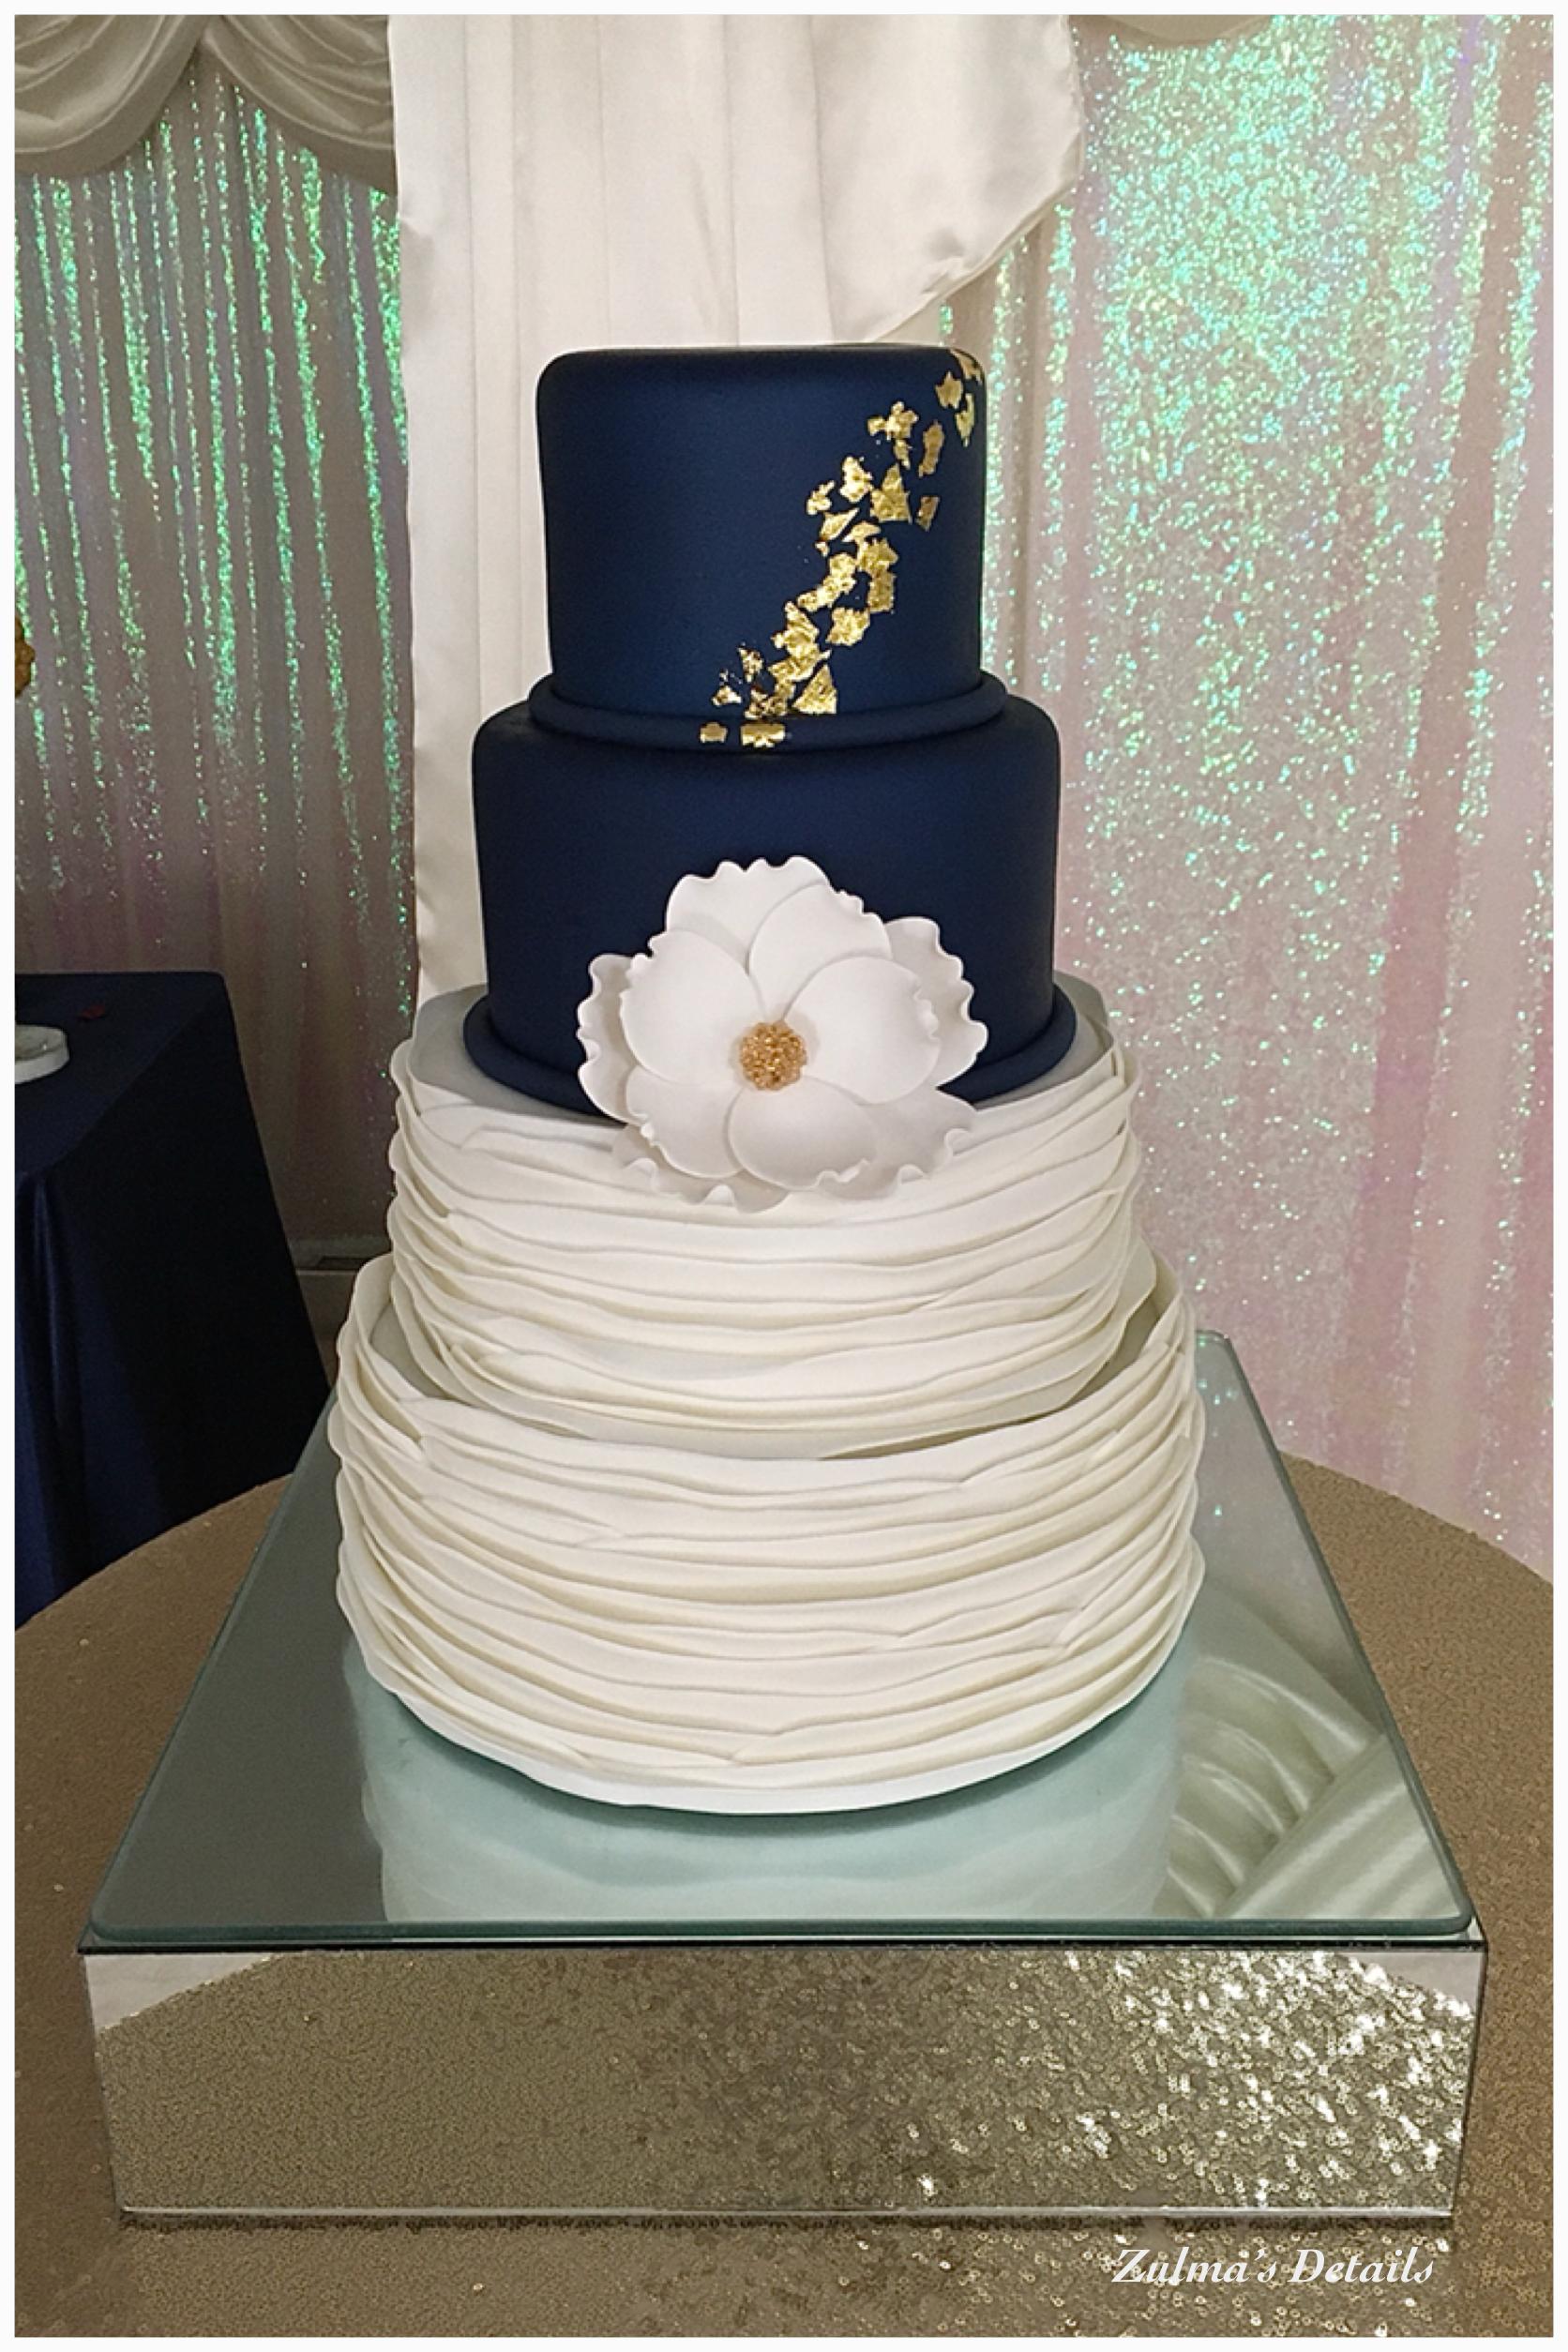 Navy Blue And White Wedding Cake In 2020 Wedding Anniversary Cakes Wedding Cakes Blue Colorful Wedding Cakes